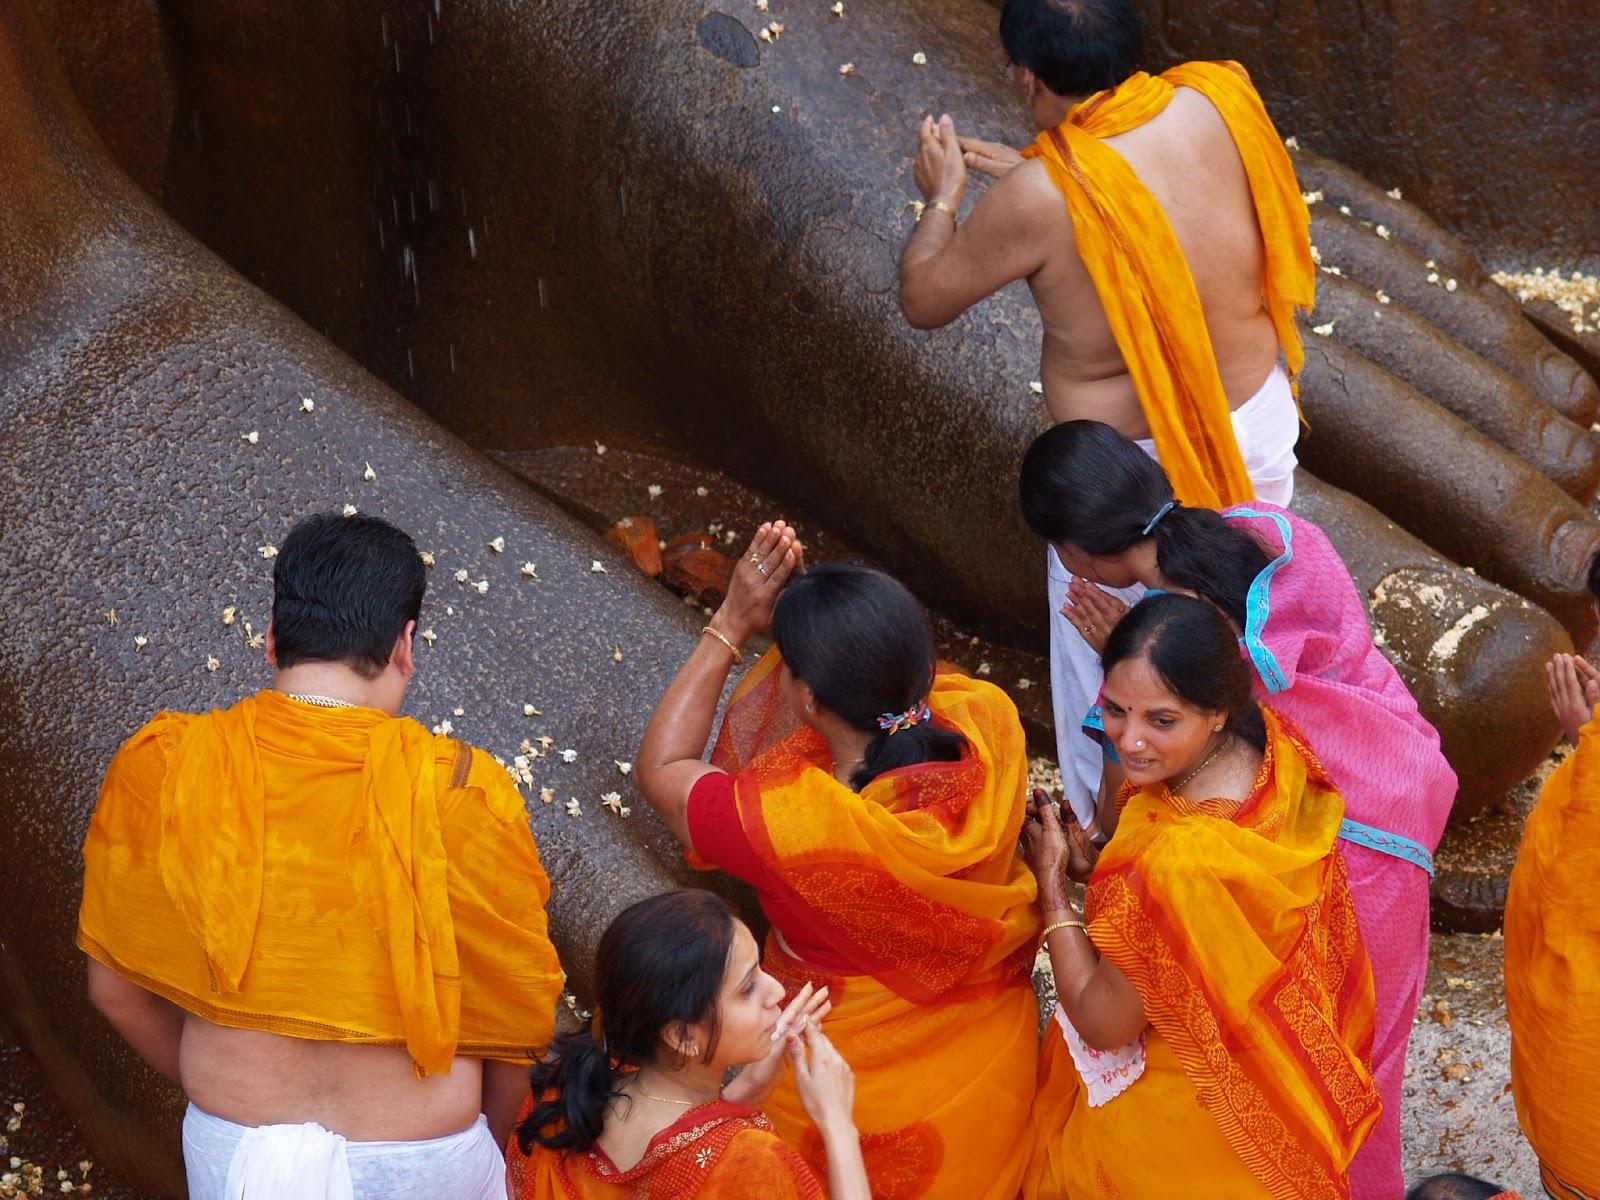 Jainalaisuus Symboli